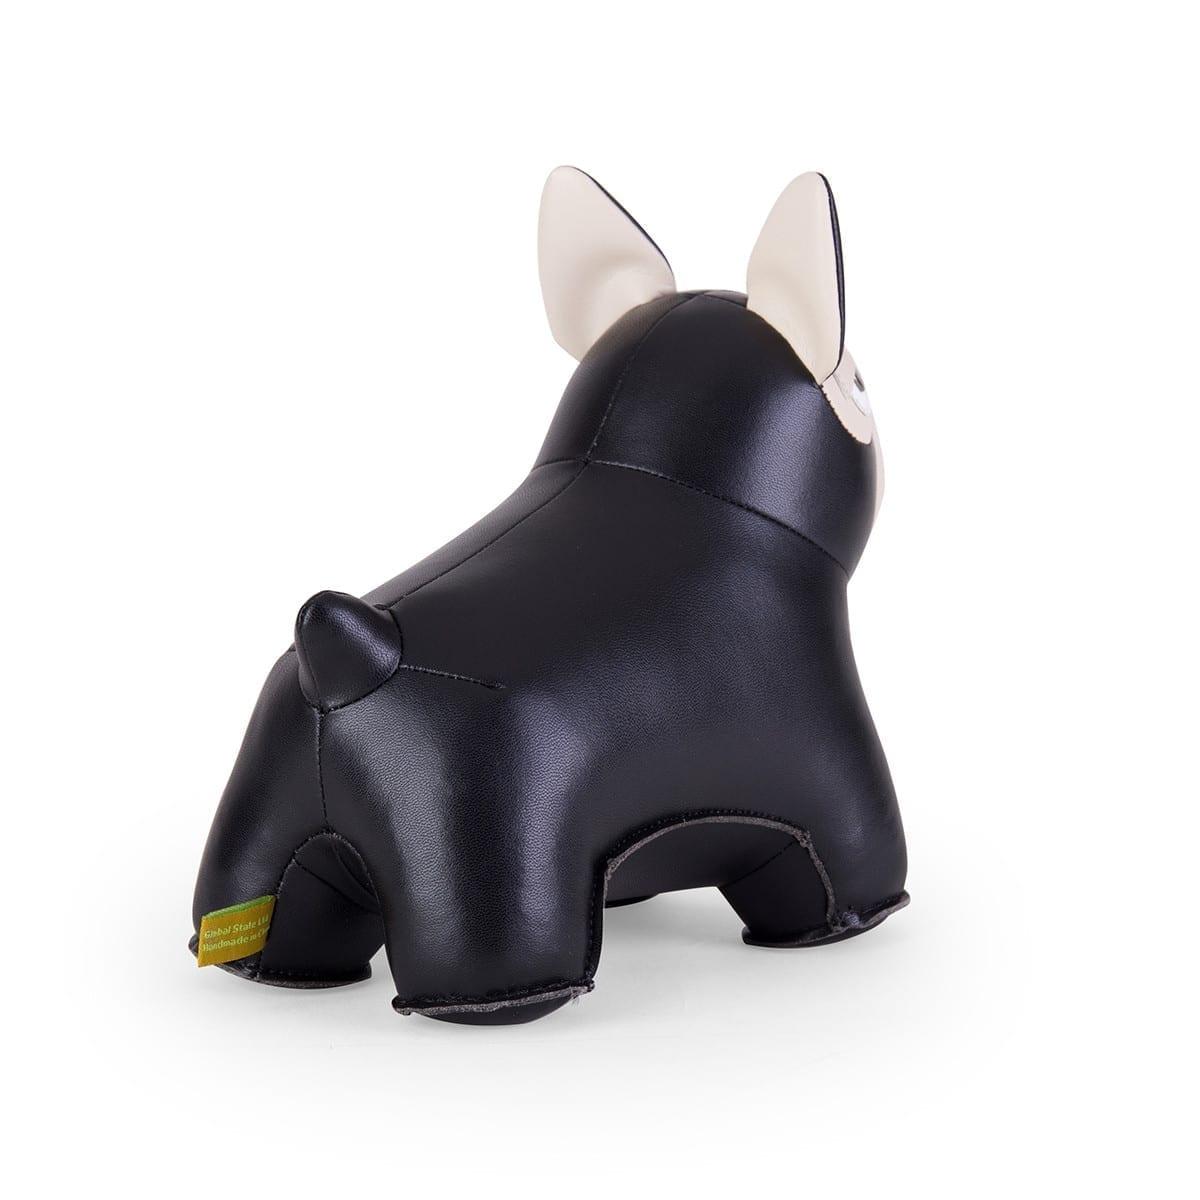 Bookend Classic French Bulldog Black